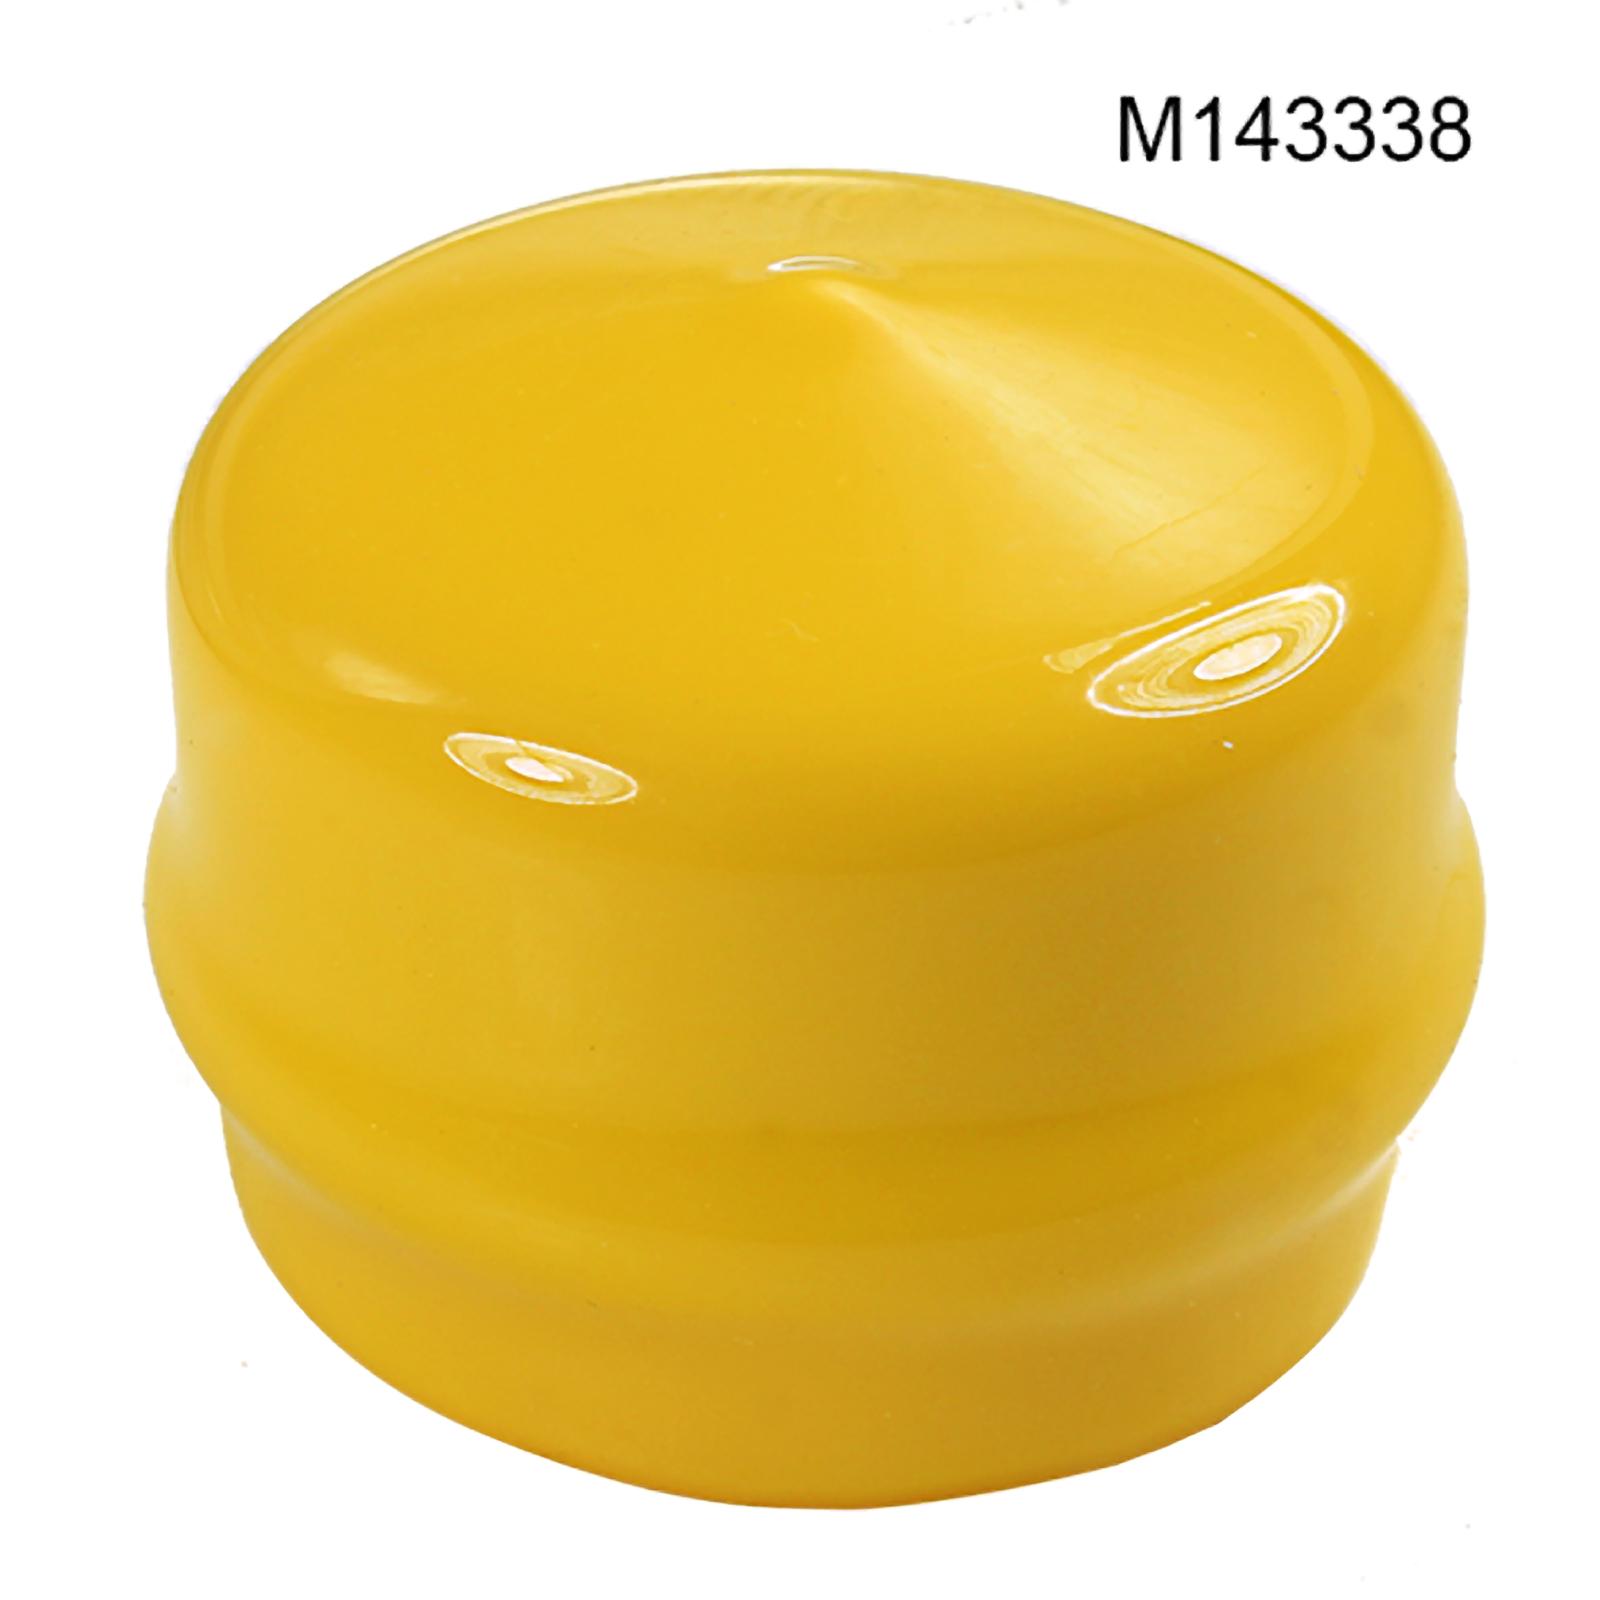 John Deere #M143338 Bearing Cover / Cap - 2 Pk